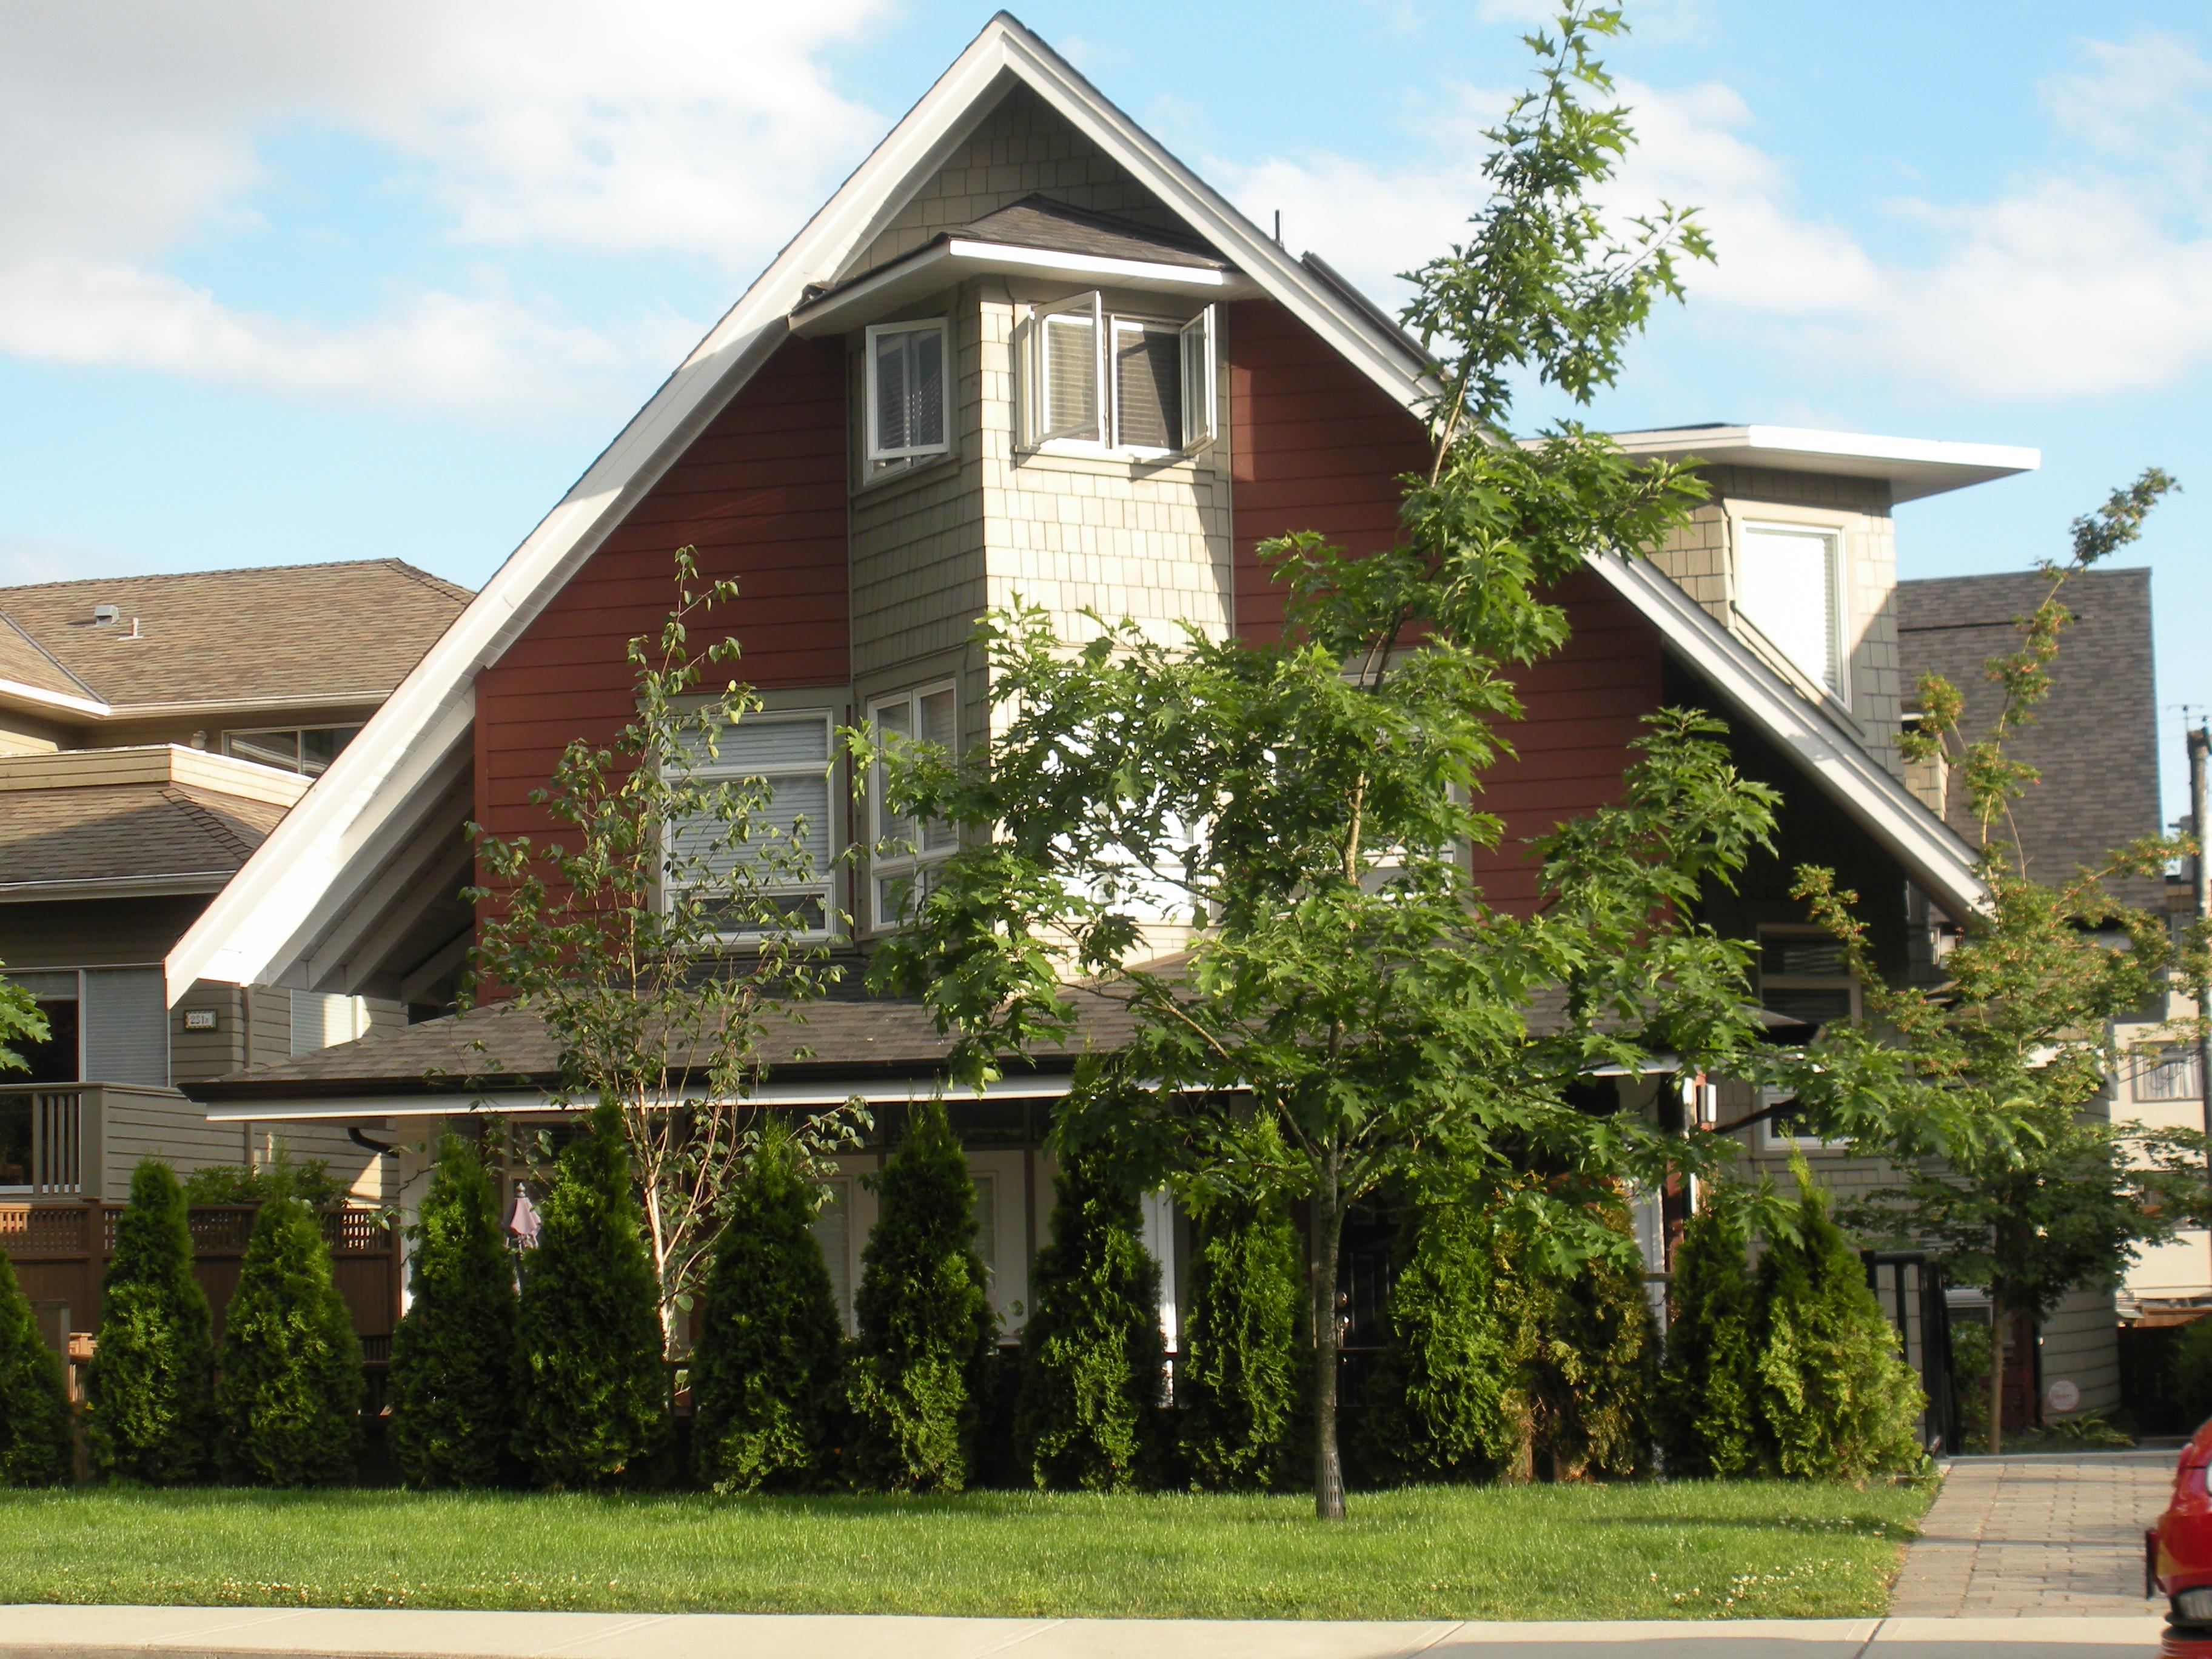 Central Lonsdale Detached Triplex for sale:  3 bedroom 1,700 sq.ft. (Listed 2009-06-23)